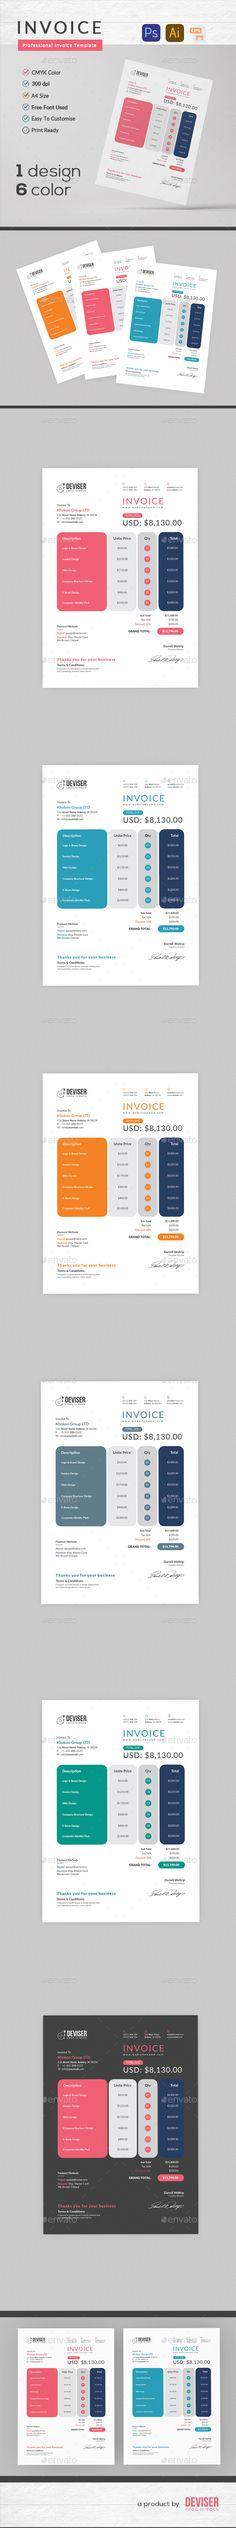 Invoice with Letterhead Letterhead - proposals templates